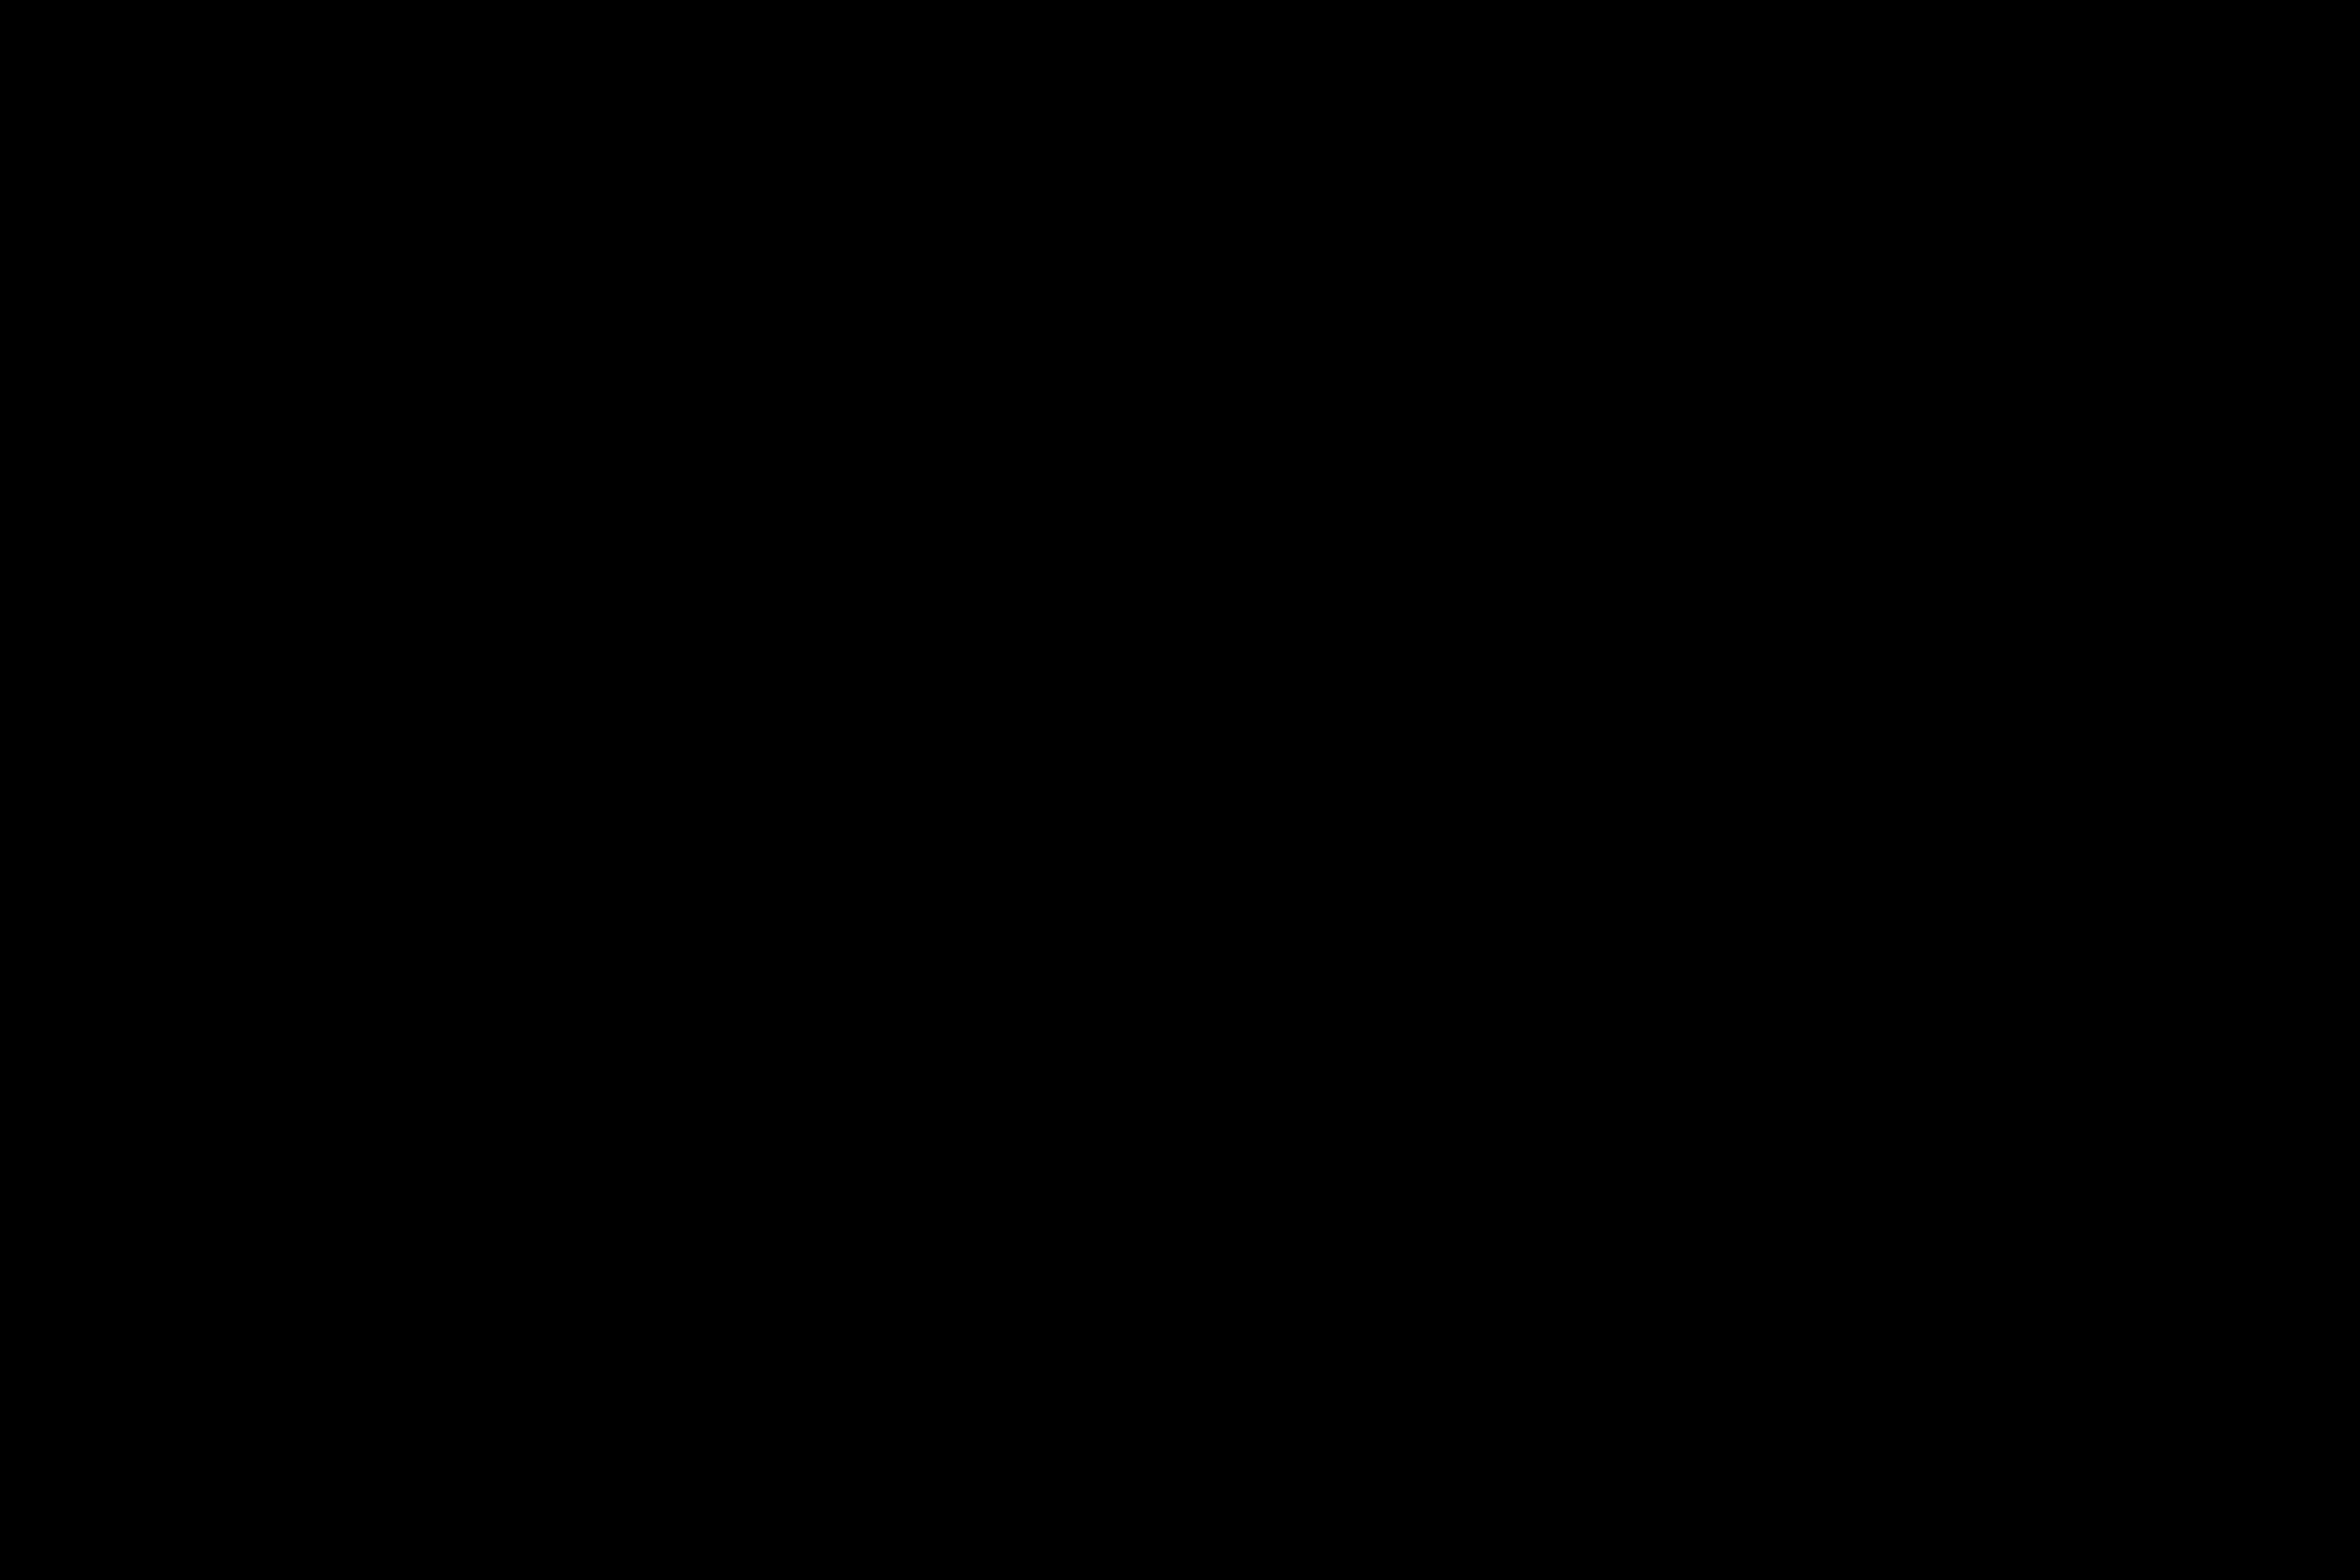 Clipart key gray. Greek pattern big image